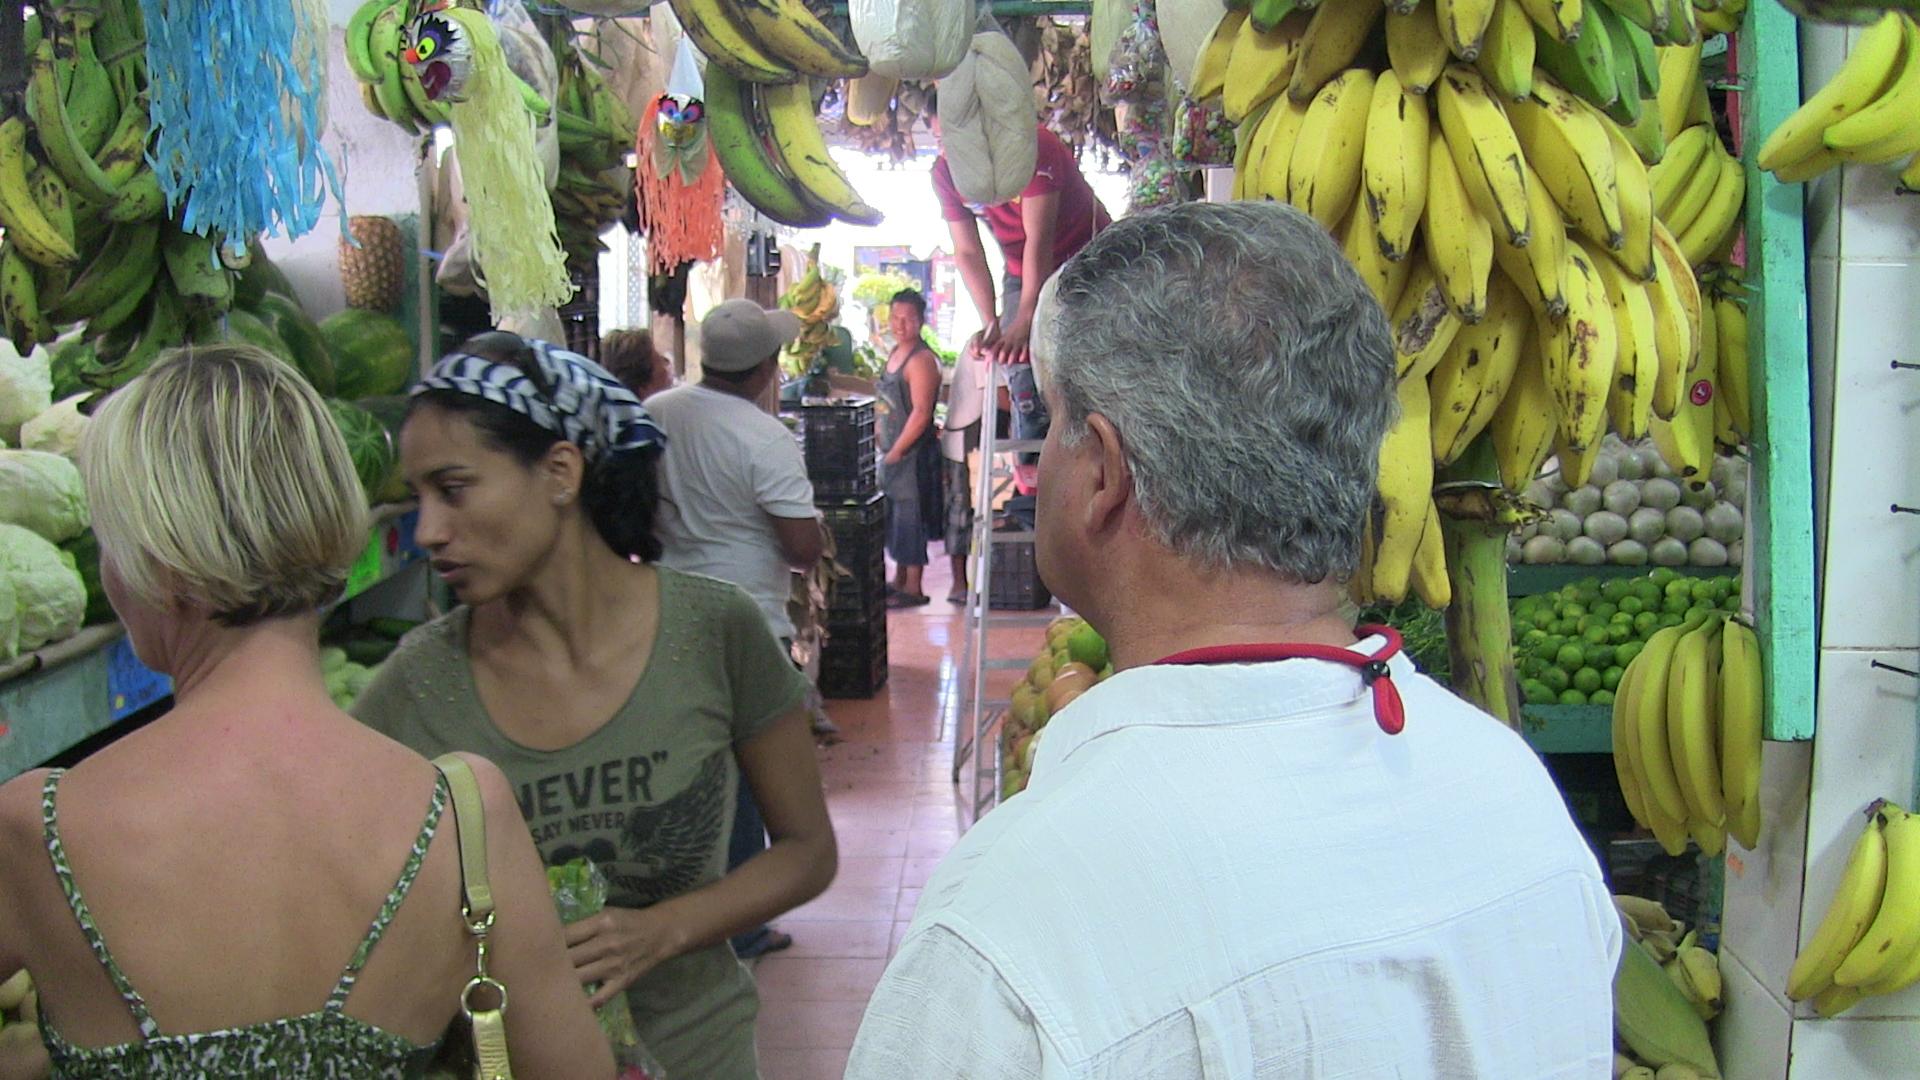 Market 23, Cancun